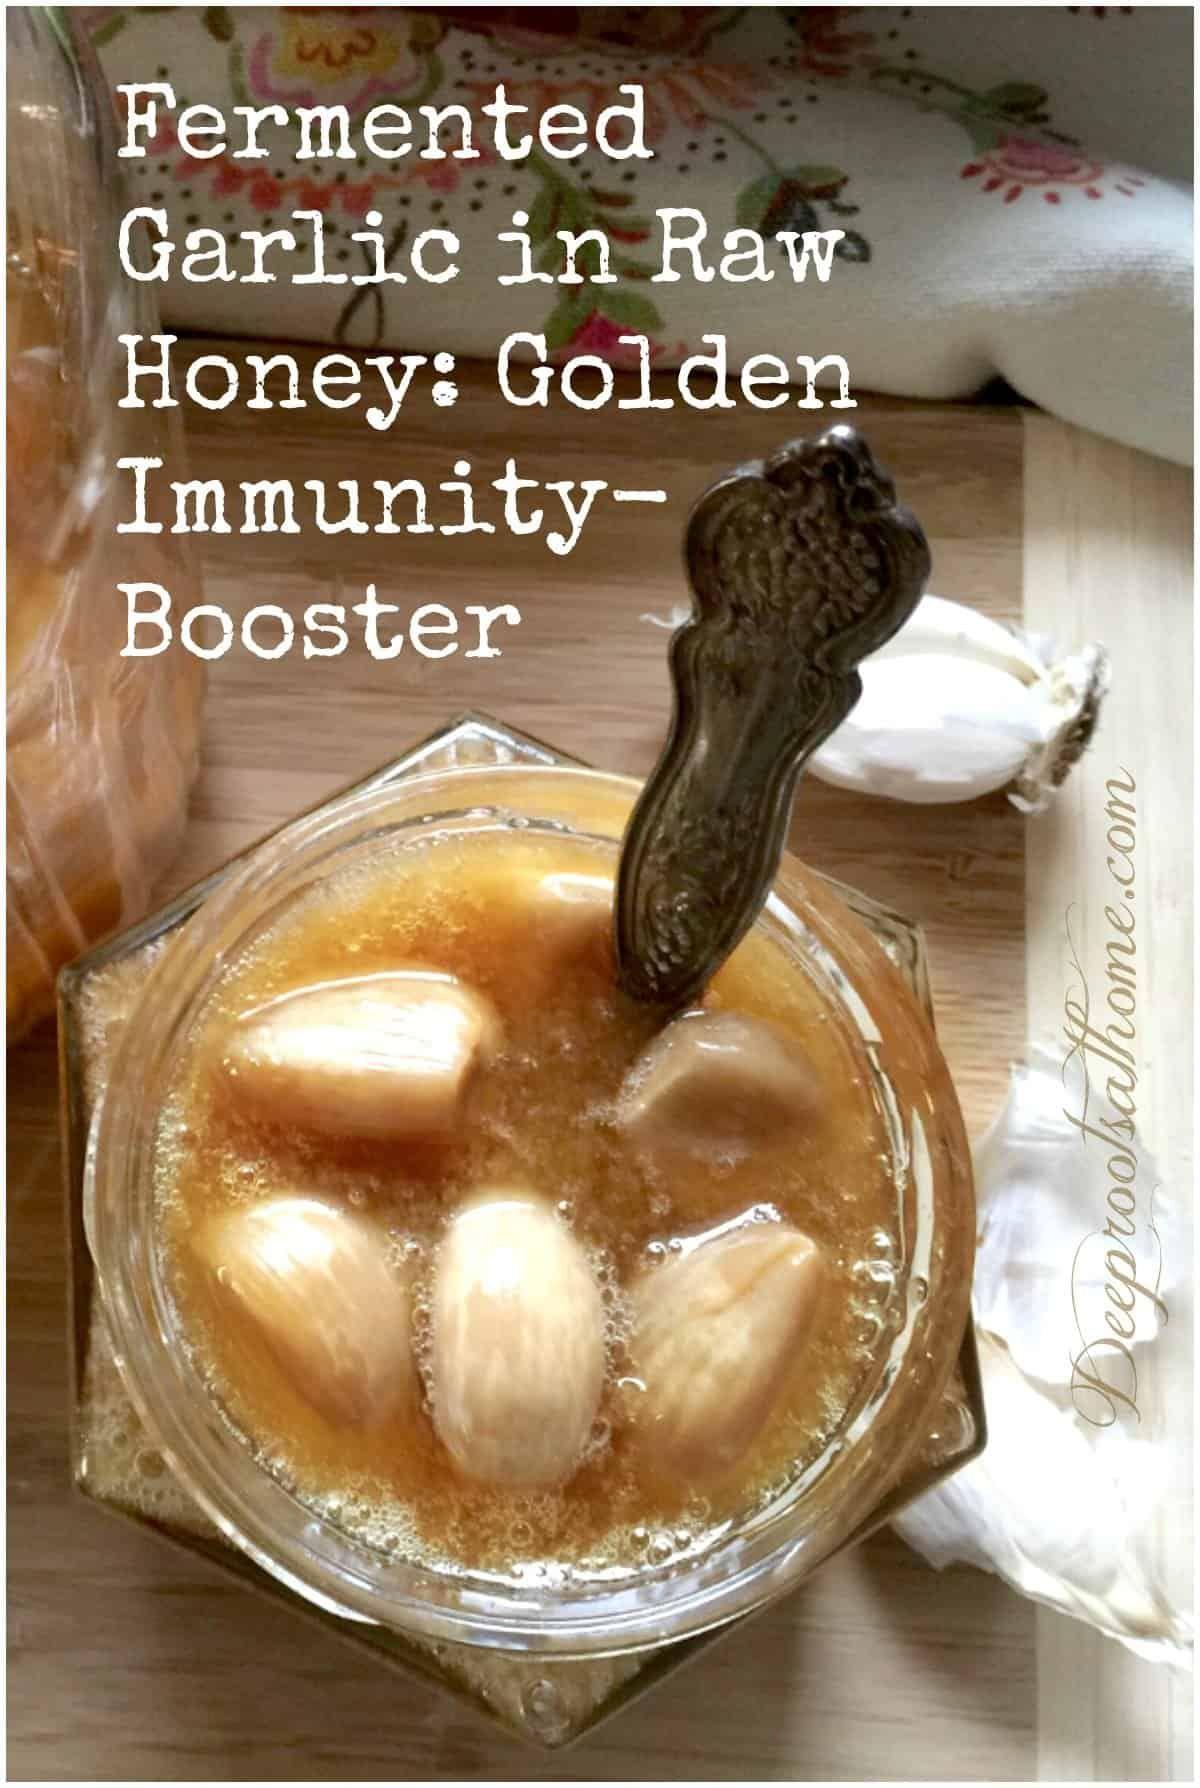 Fermented Garlic in Raw Honey: Golden Immunity-Booster. #food #recipe #health #healthy #diy #natural...